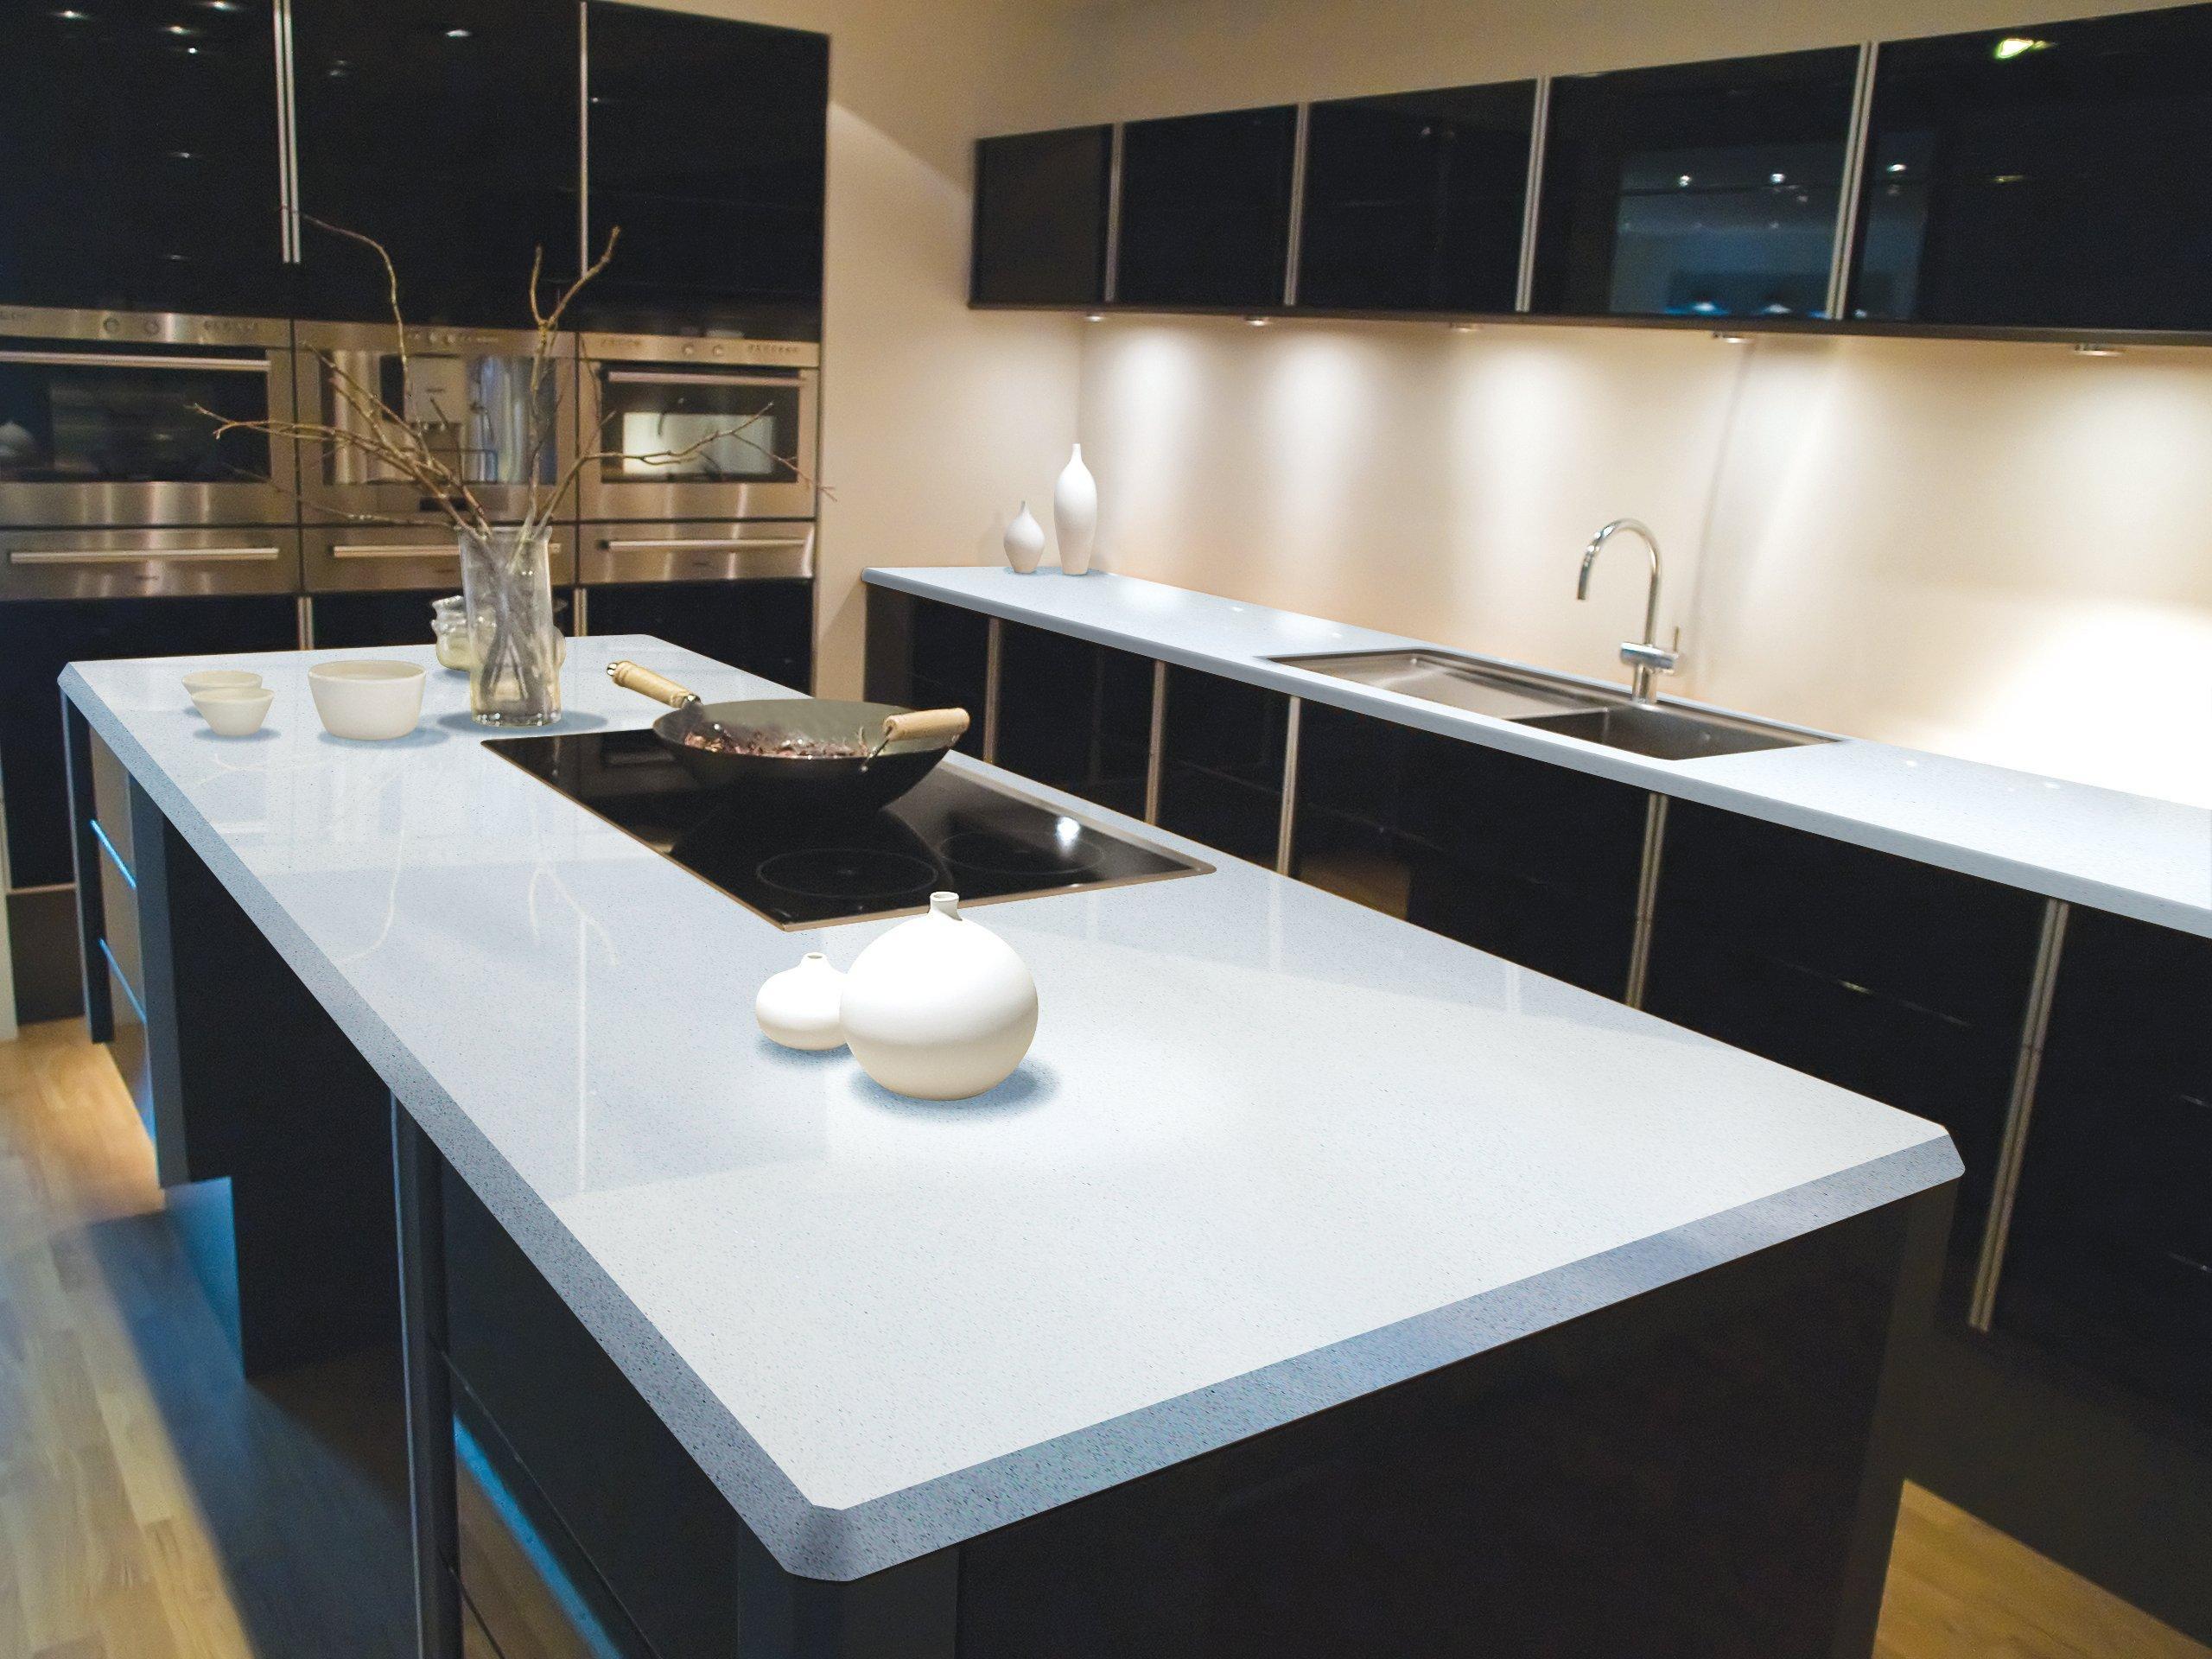 countertops that quartz sparkle like look grey countertop kitchen marble dark engineered white granite